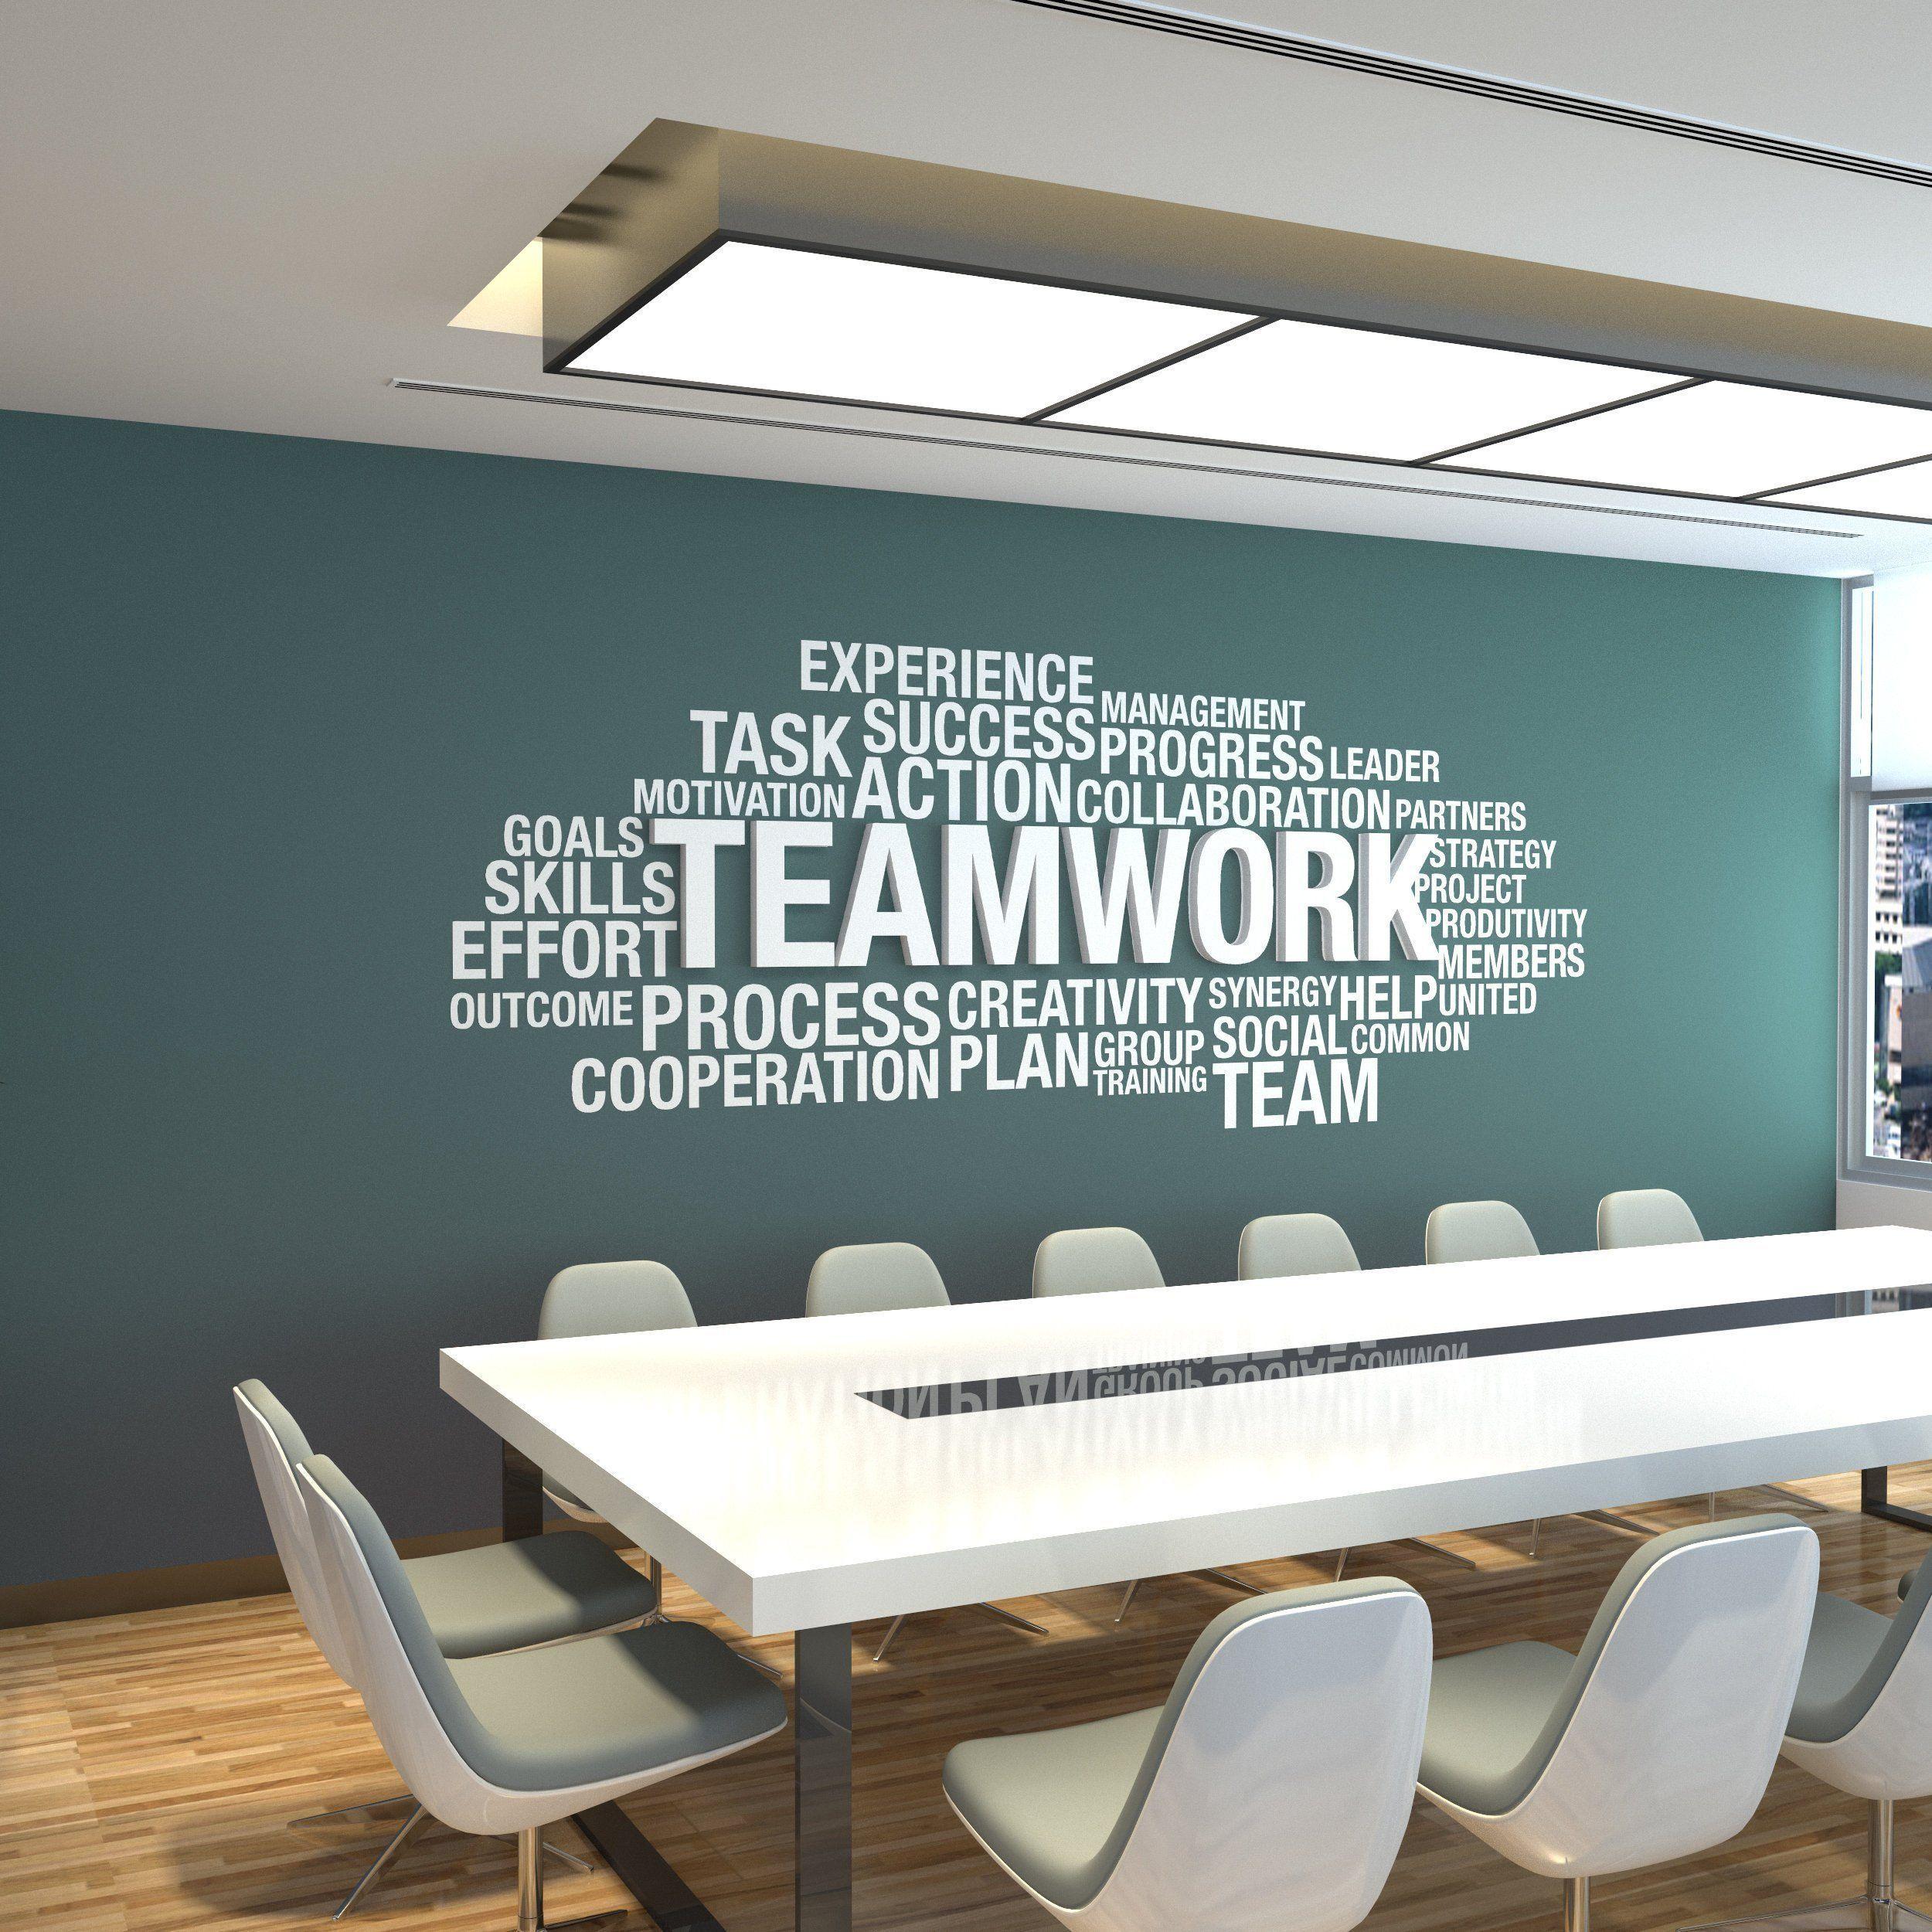 Office Wall Art Office Decor Office Wall Office Wall Decor Teamwork Dimensional Teamwork 3d In 2020 Office Wall Design Corporate Office Design Office Wall Decor